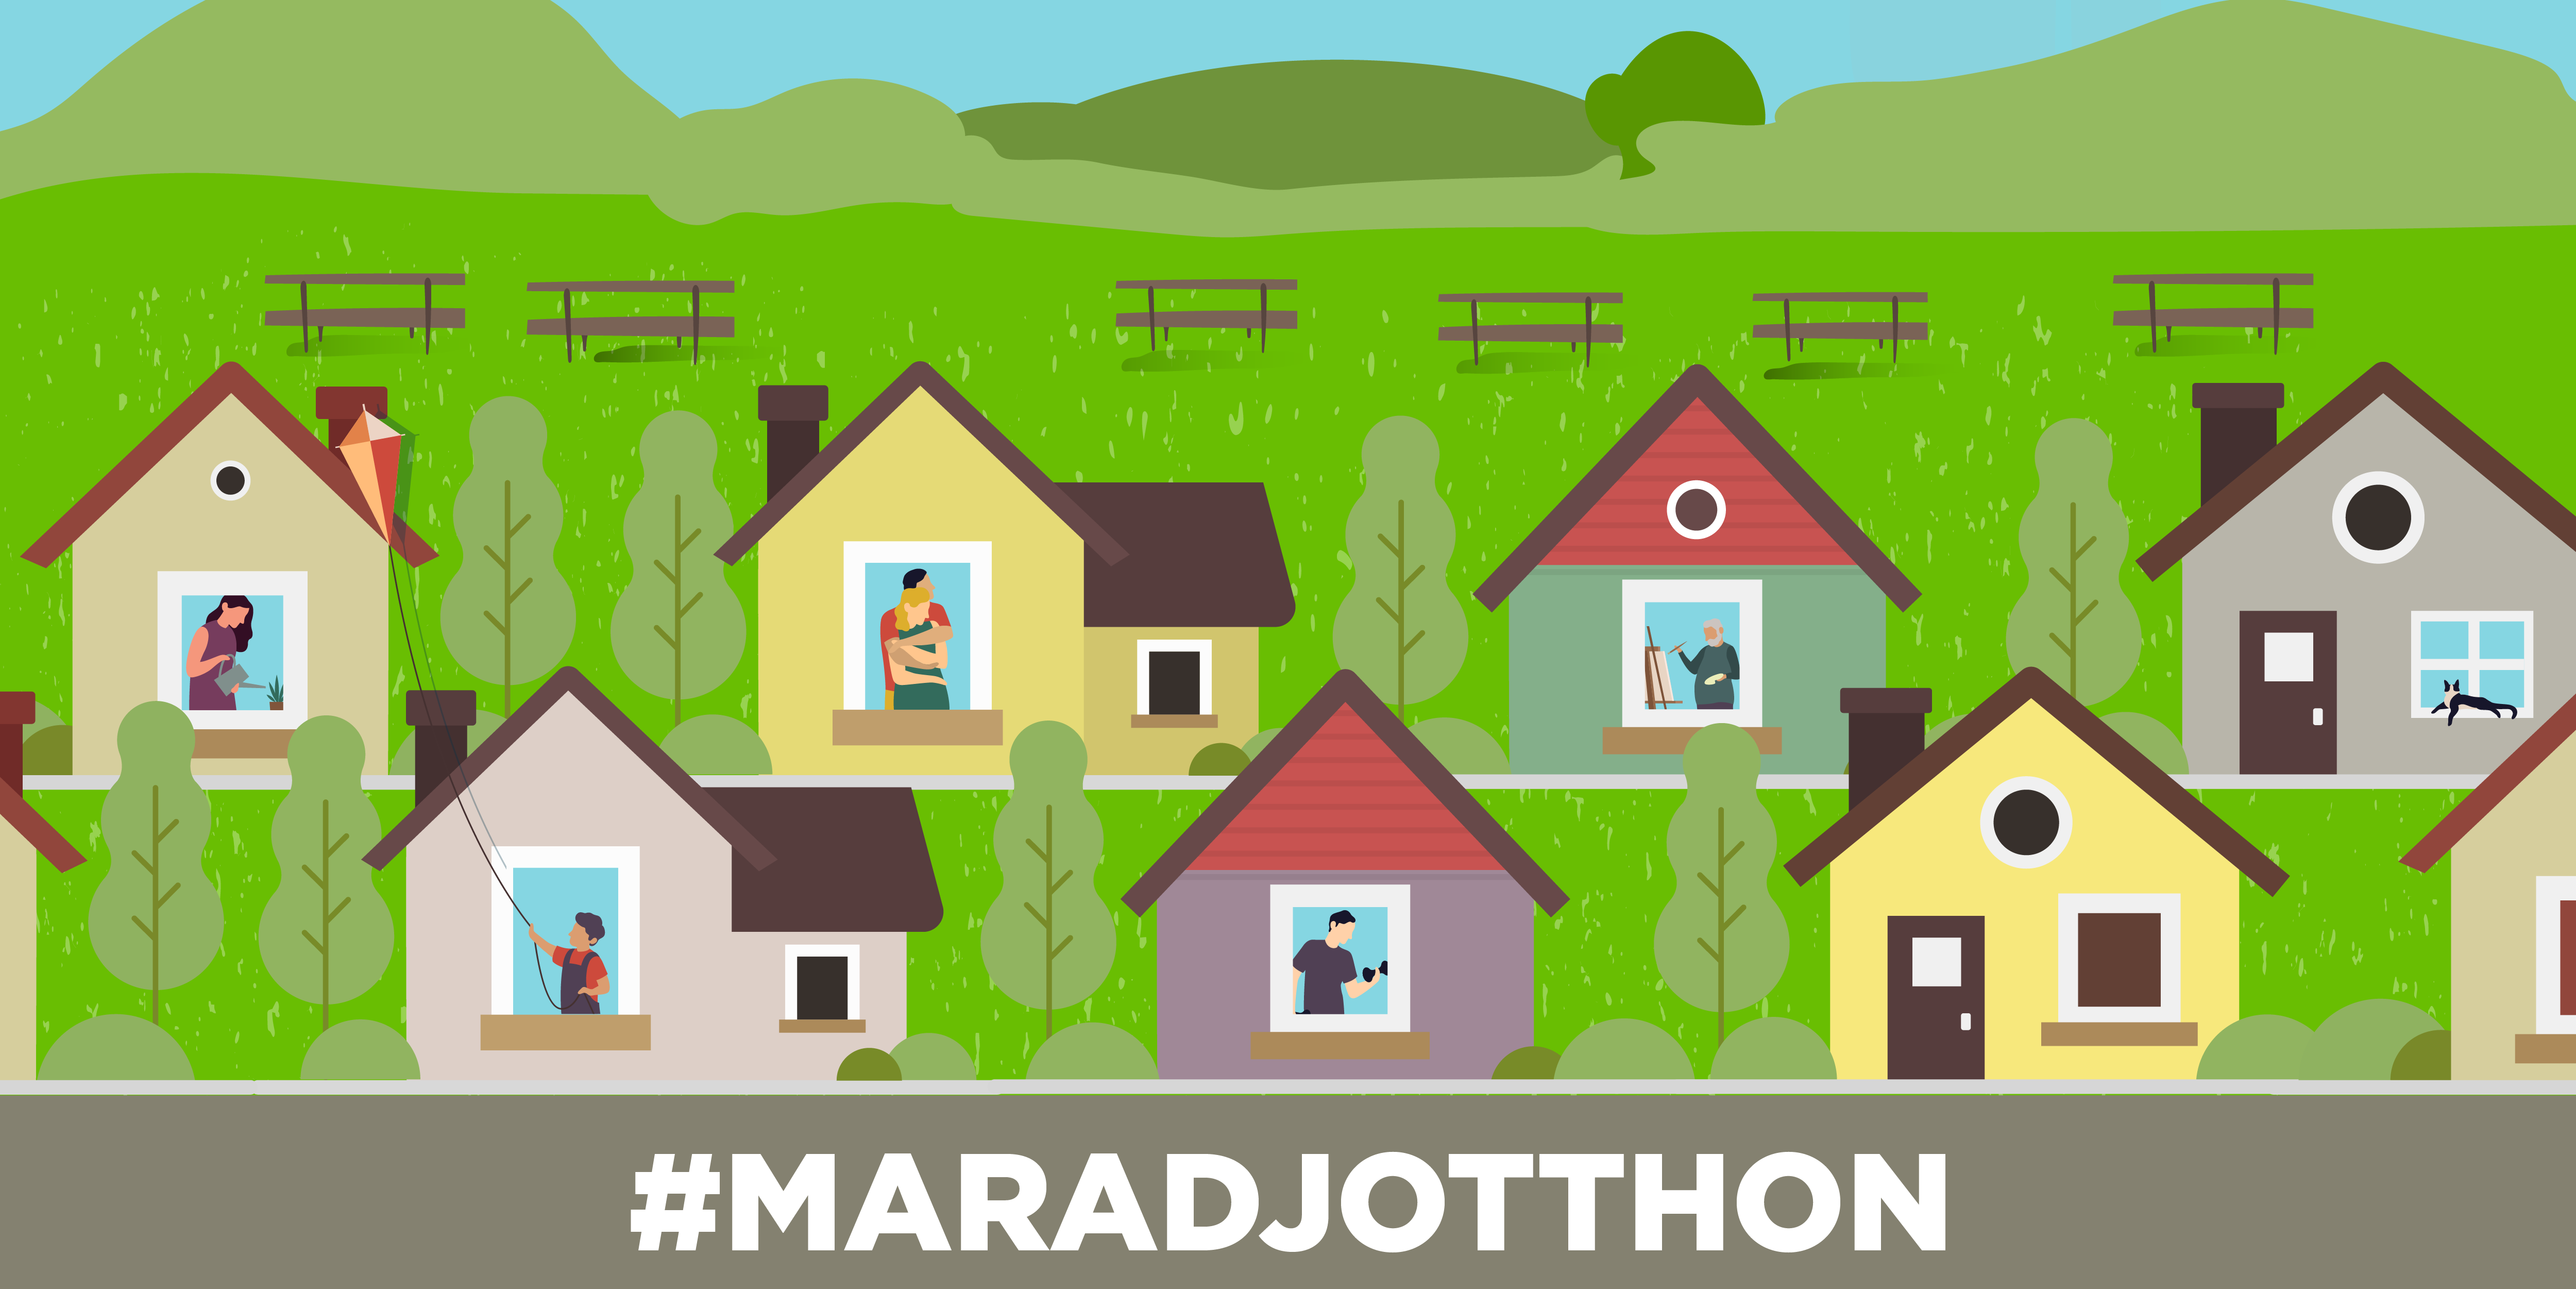 maradjotthon_cover-01.png